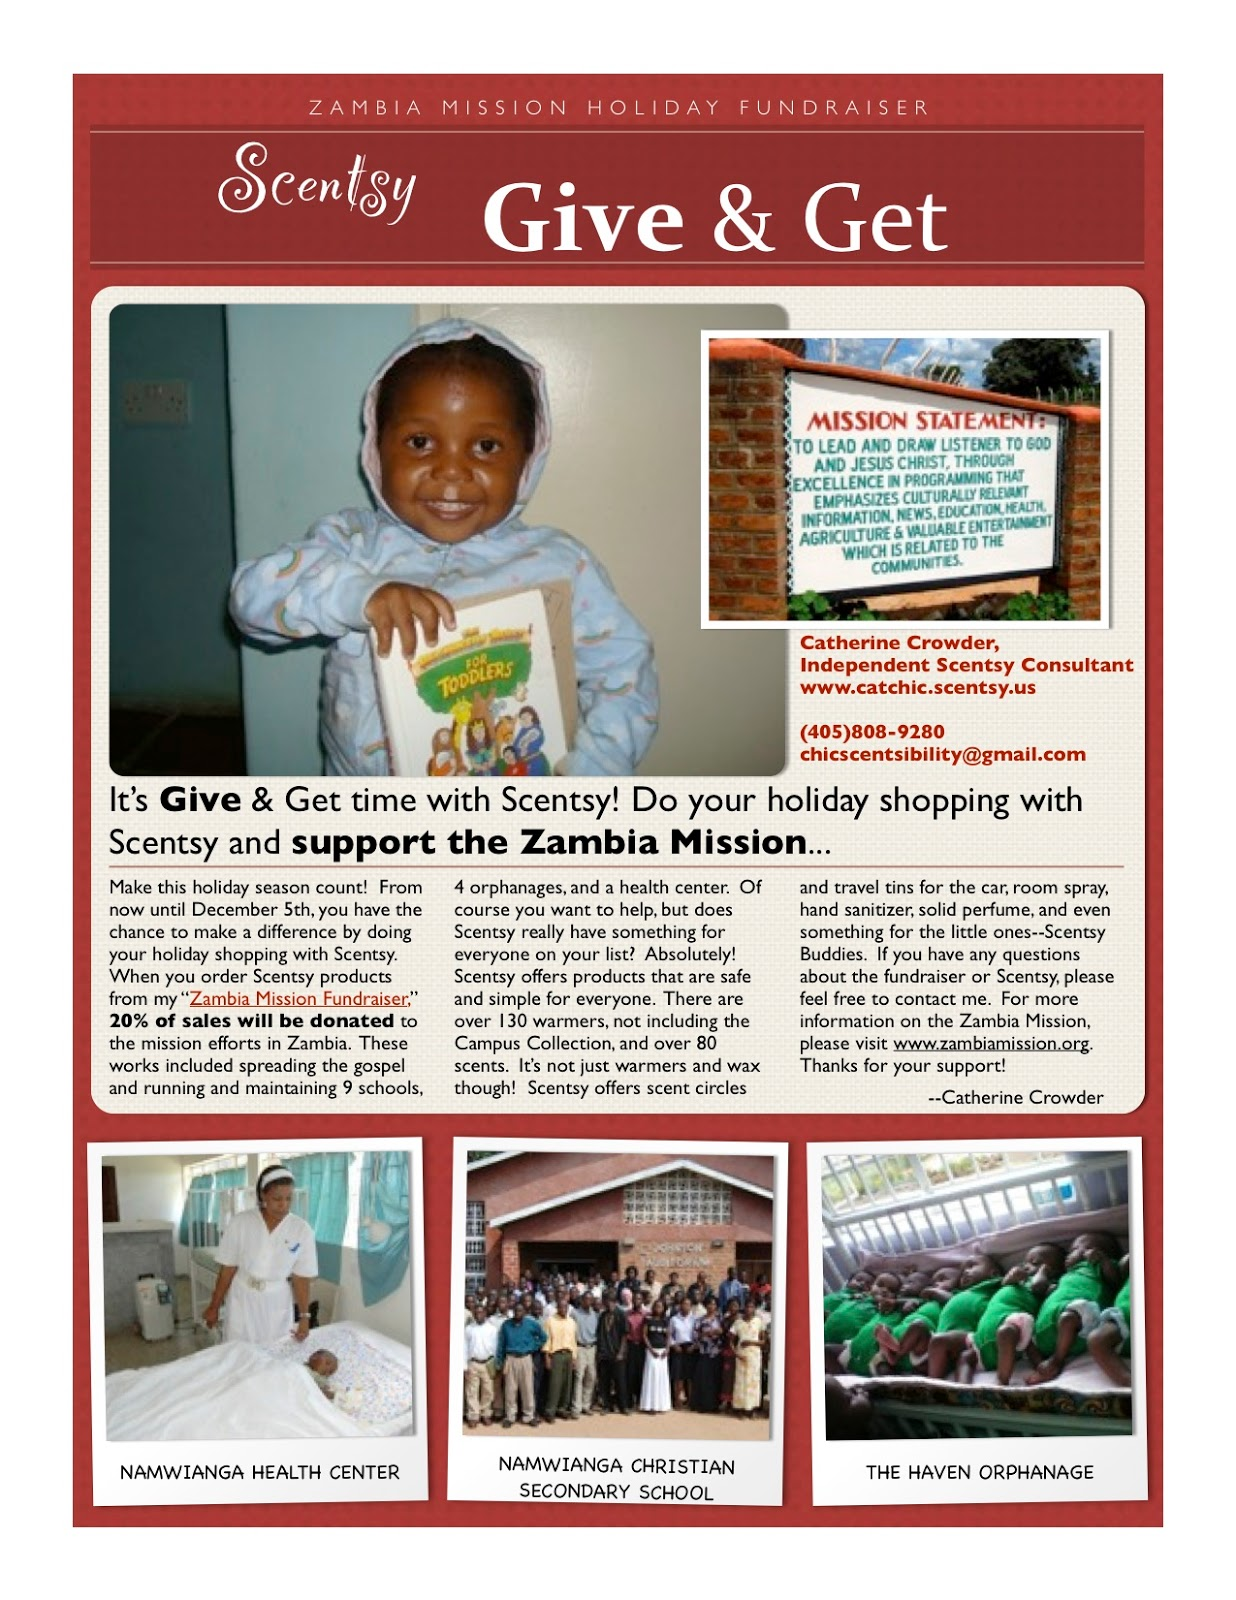 http://1.bp.blogspot.com/-1Cn0JGRngpI/Trvm9mrQ7rI/AAAAAAAAALg/-iGk4Dt6OXo/s1600/Zambia+Fundraiser.jpg